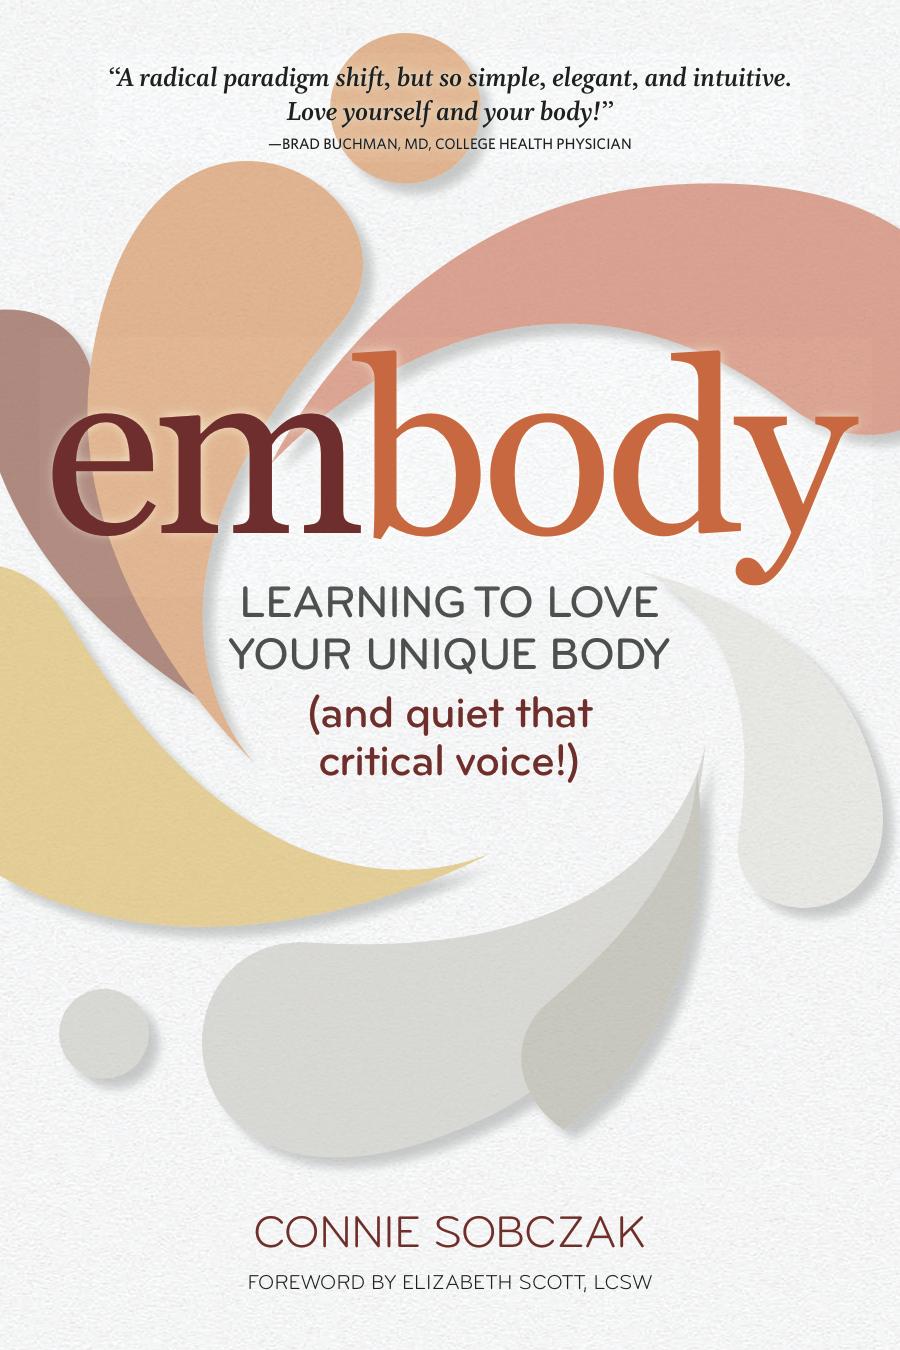 Embody book